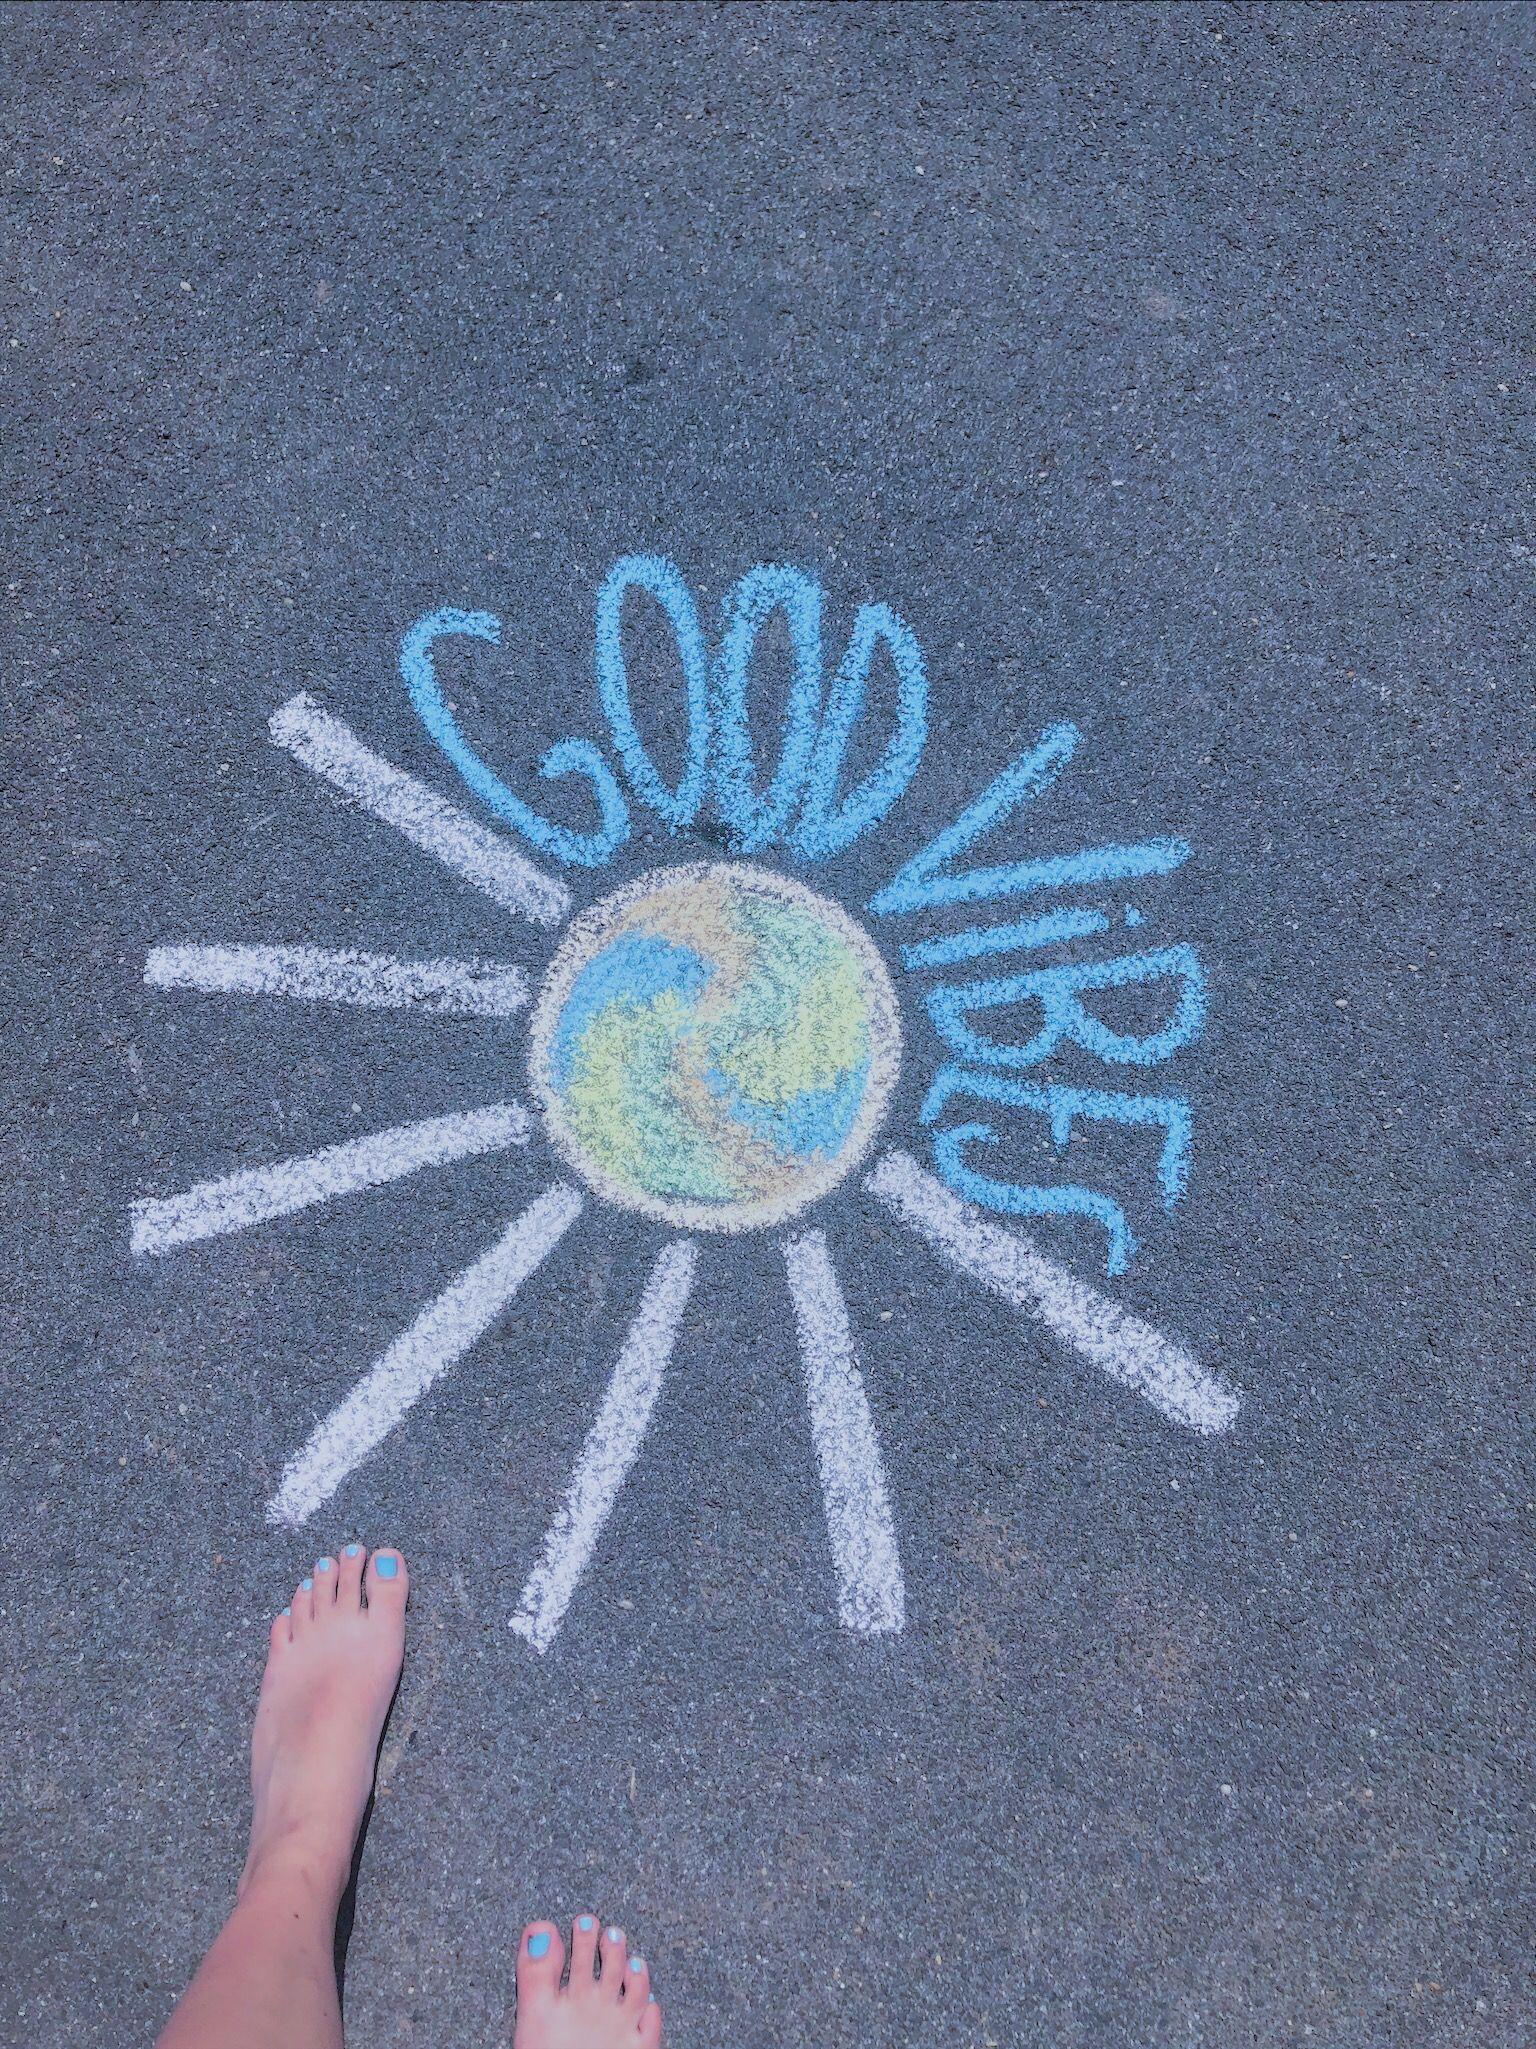 Vsco Trinitybailey With Images Sidewalk Chalk Art Sidewalk